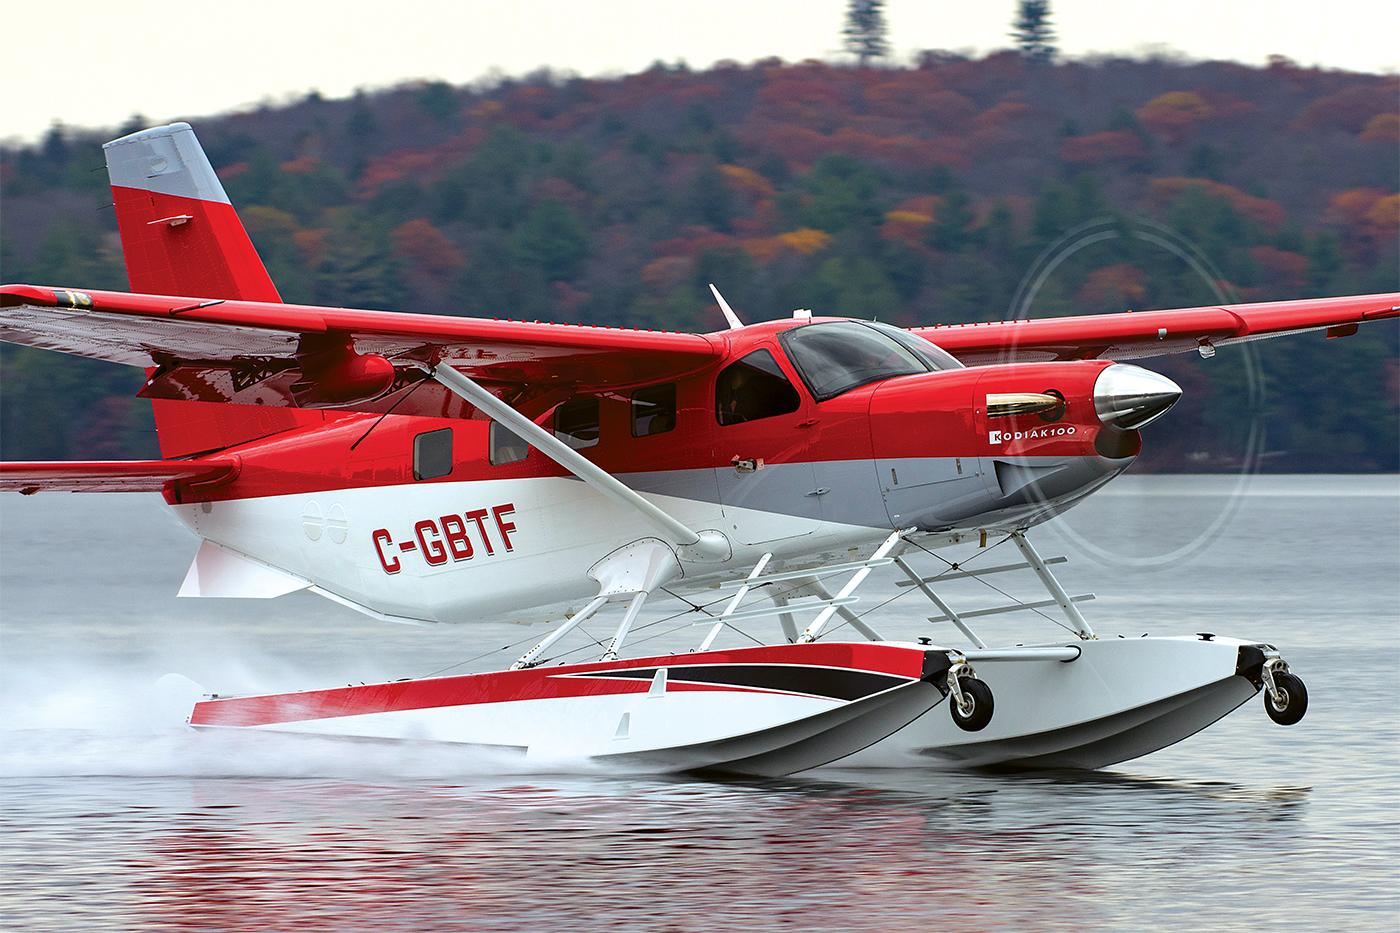 Aerodynamics meets hydronamics -- the Kodiak seems ready to leap into the air courtesy of its super efficient Aerocet 6650 composite floats. Eric Dumigan Photo